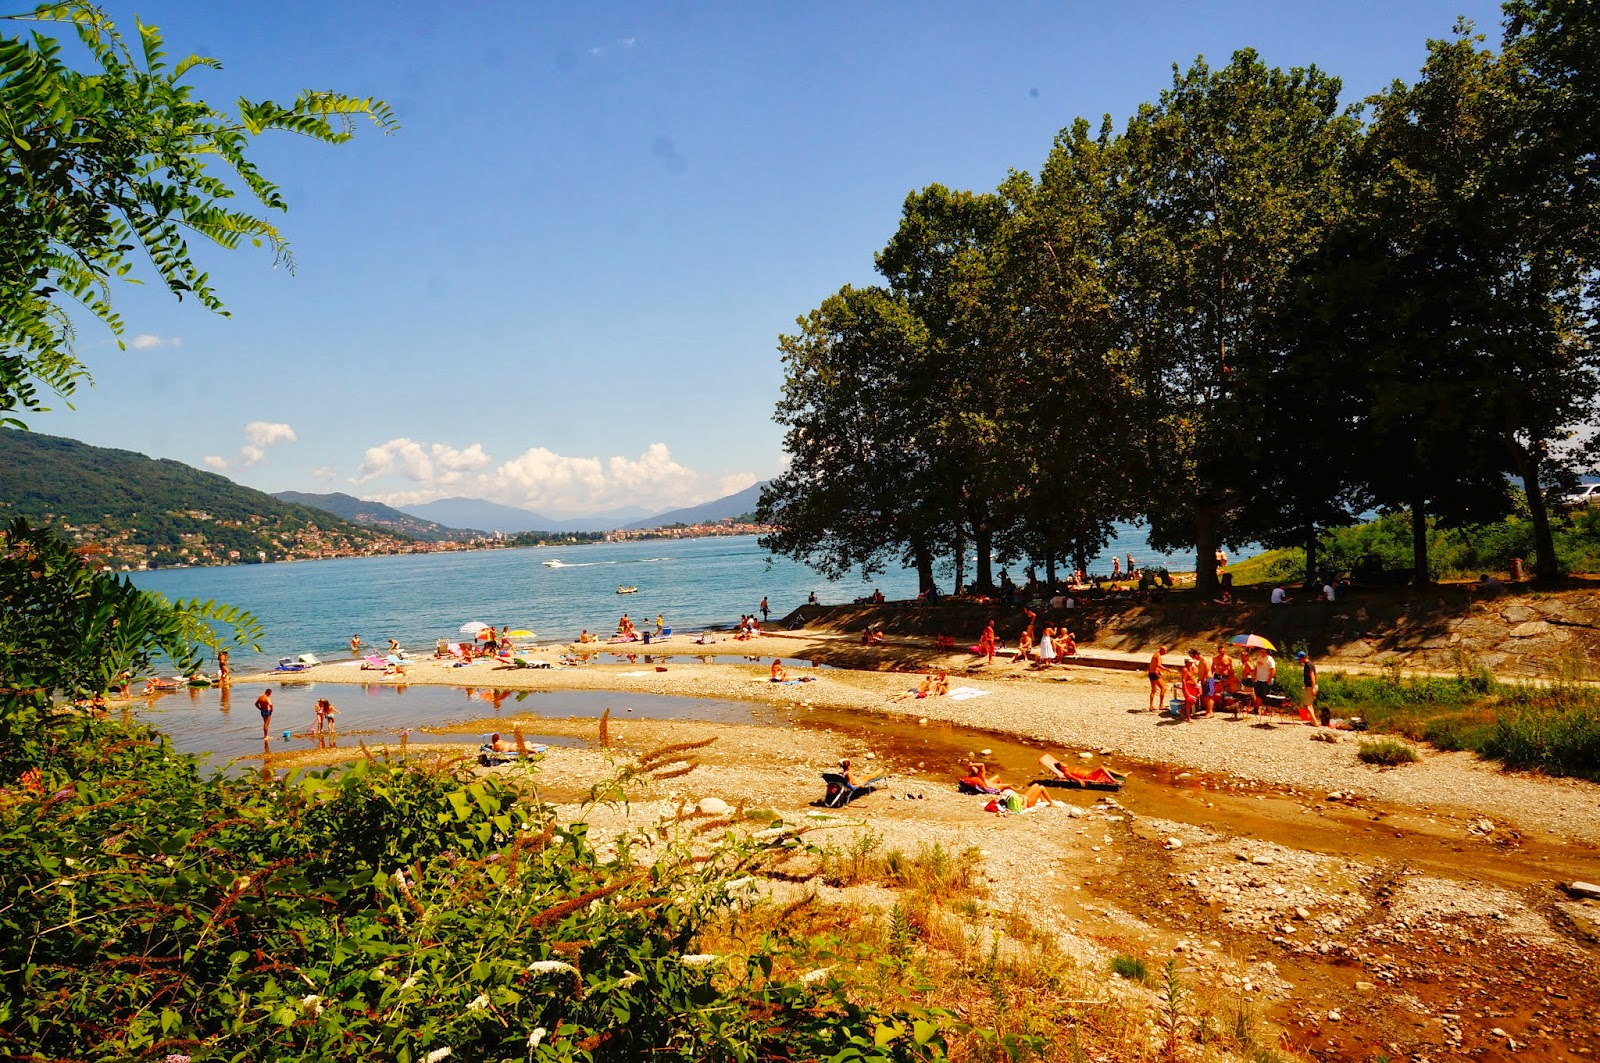 Baveno-Beach